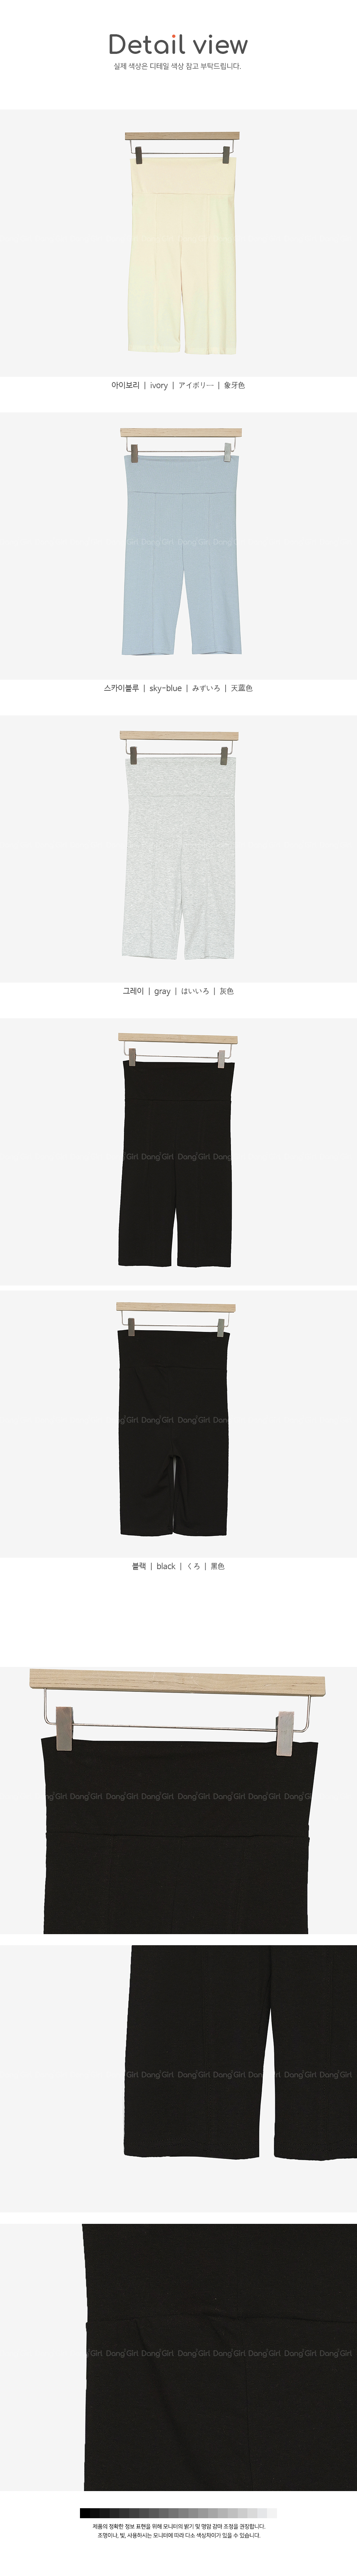 26-32 inch Urban Banding Simple 5 Piece Leggings